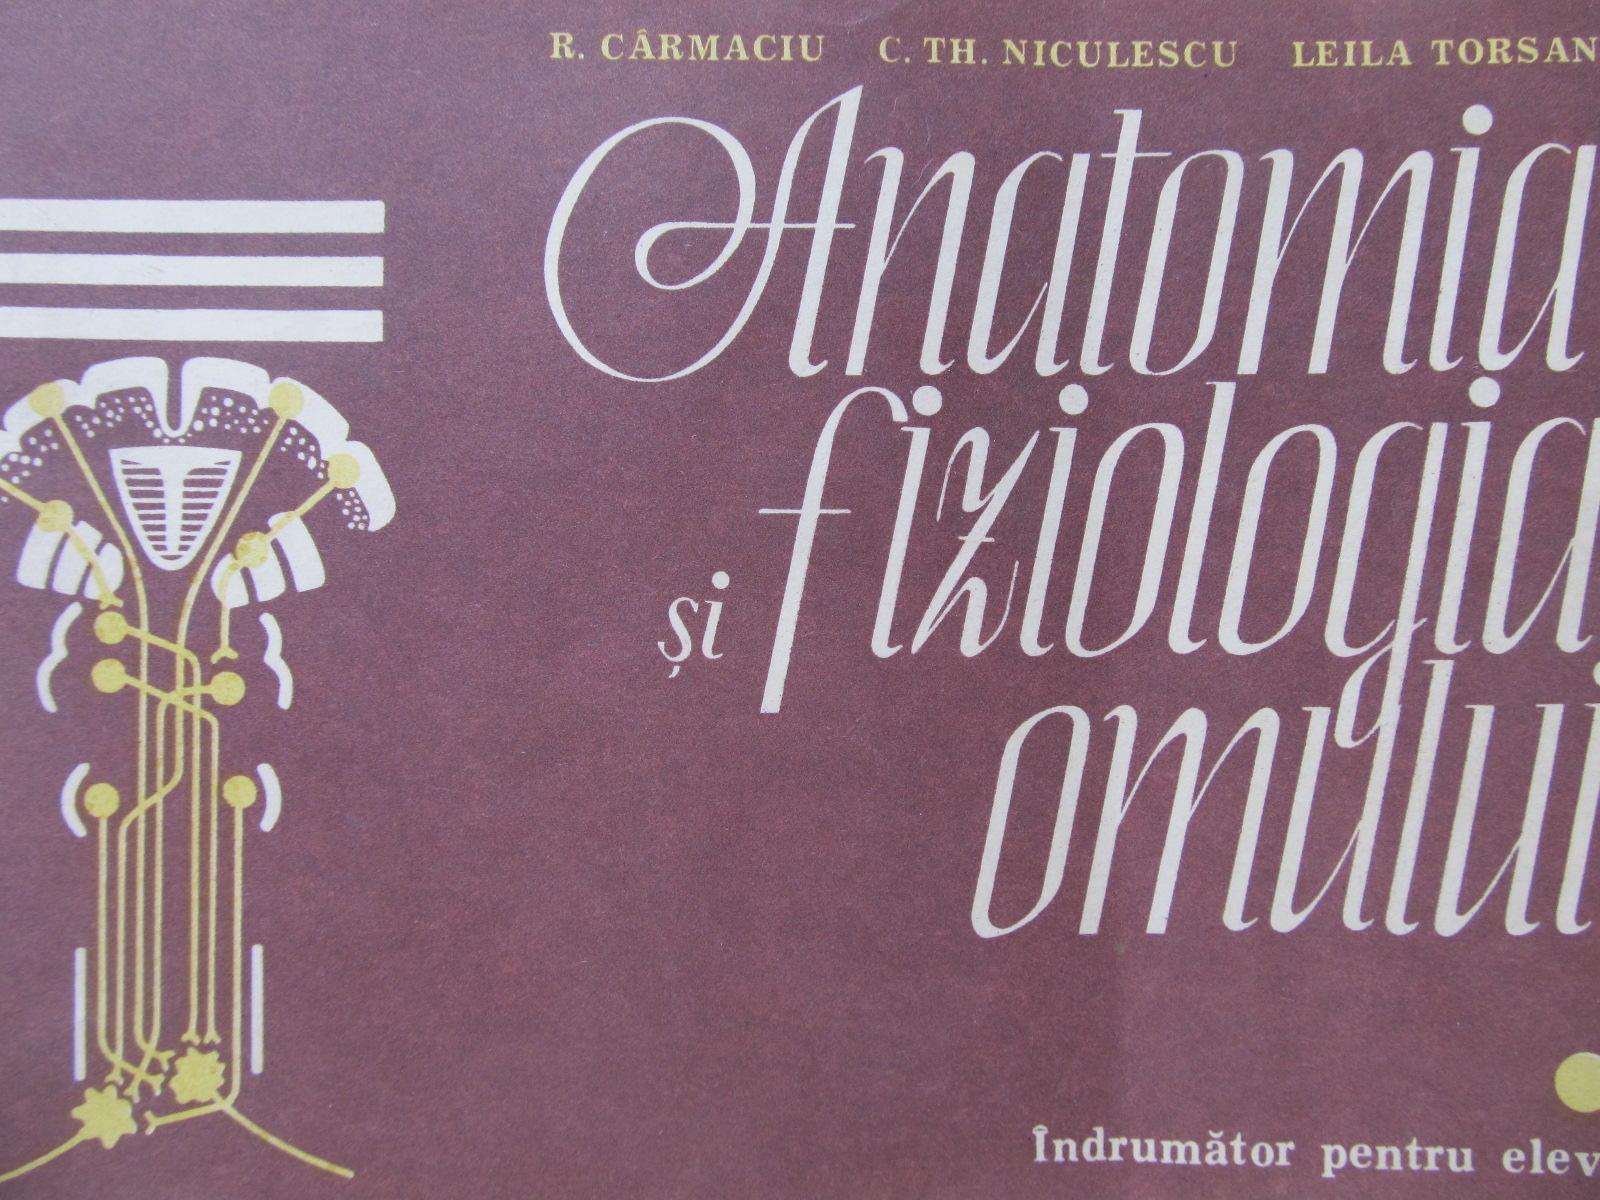 Anatomia si fiziologia omului - Indrumator pentru elevi - R. Carmaciu , C. Th. Niculescu | Detalii carte